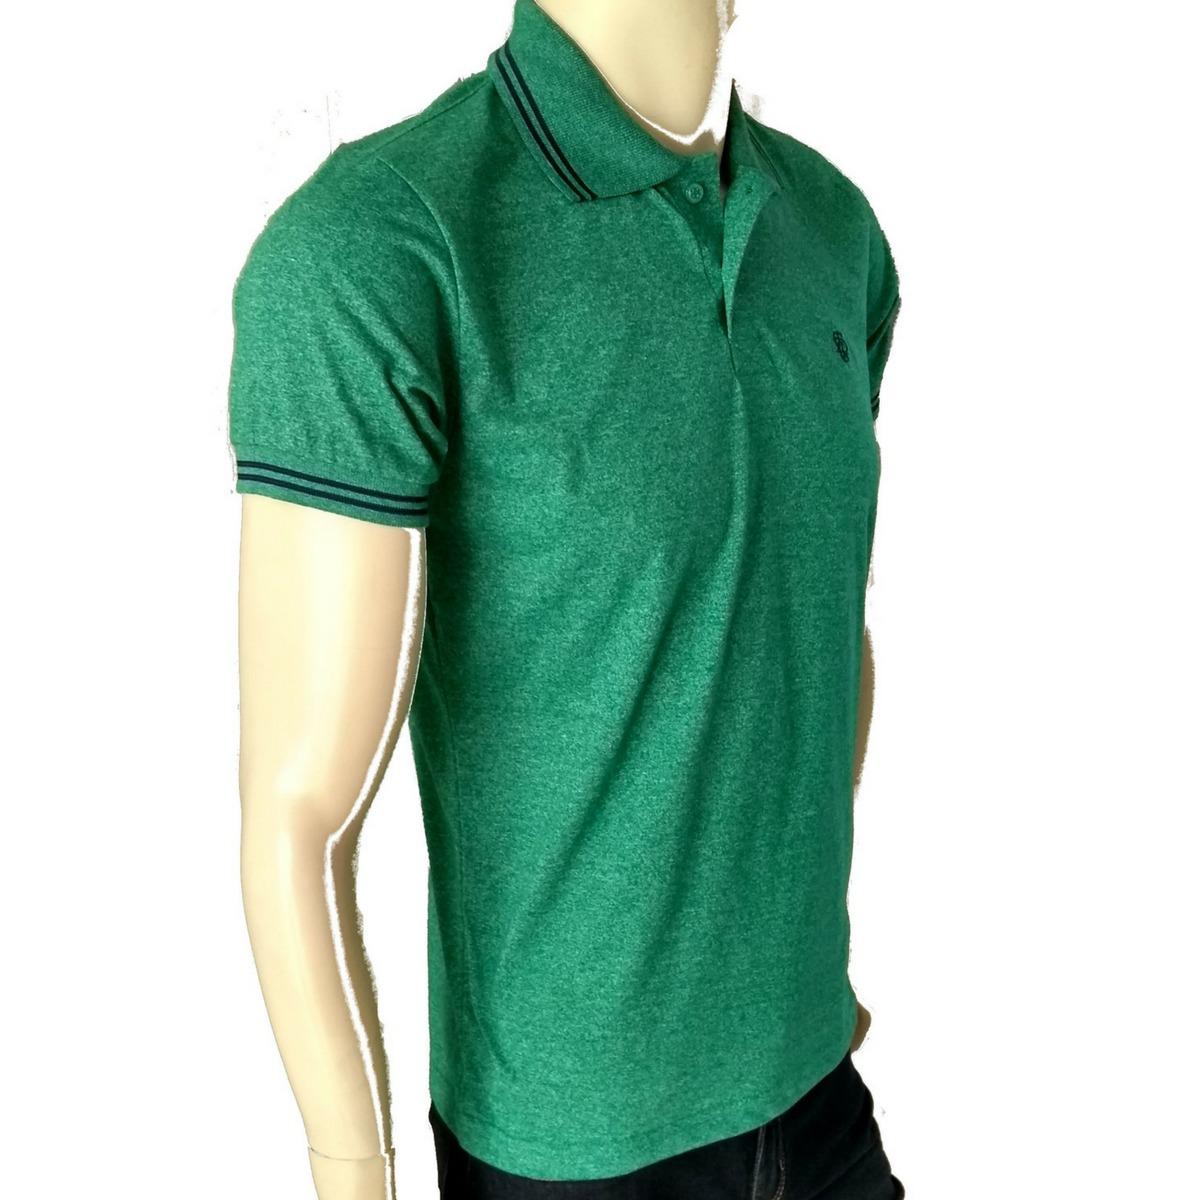 camisa polo masculina promocao direto de fabrica menor preco. Carregando  zoom. 85abea428650e